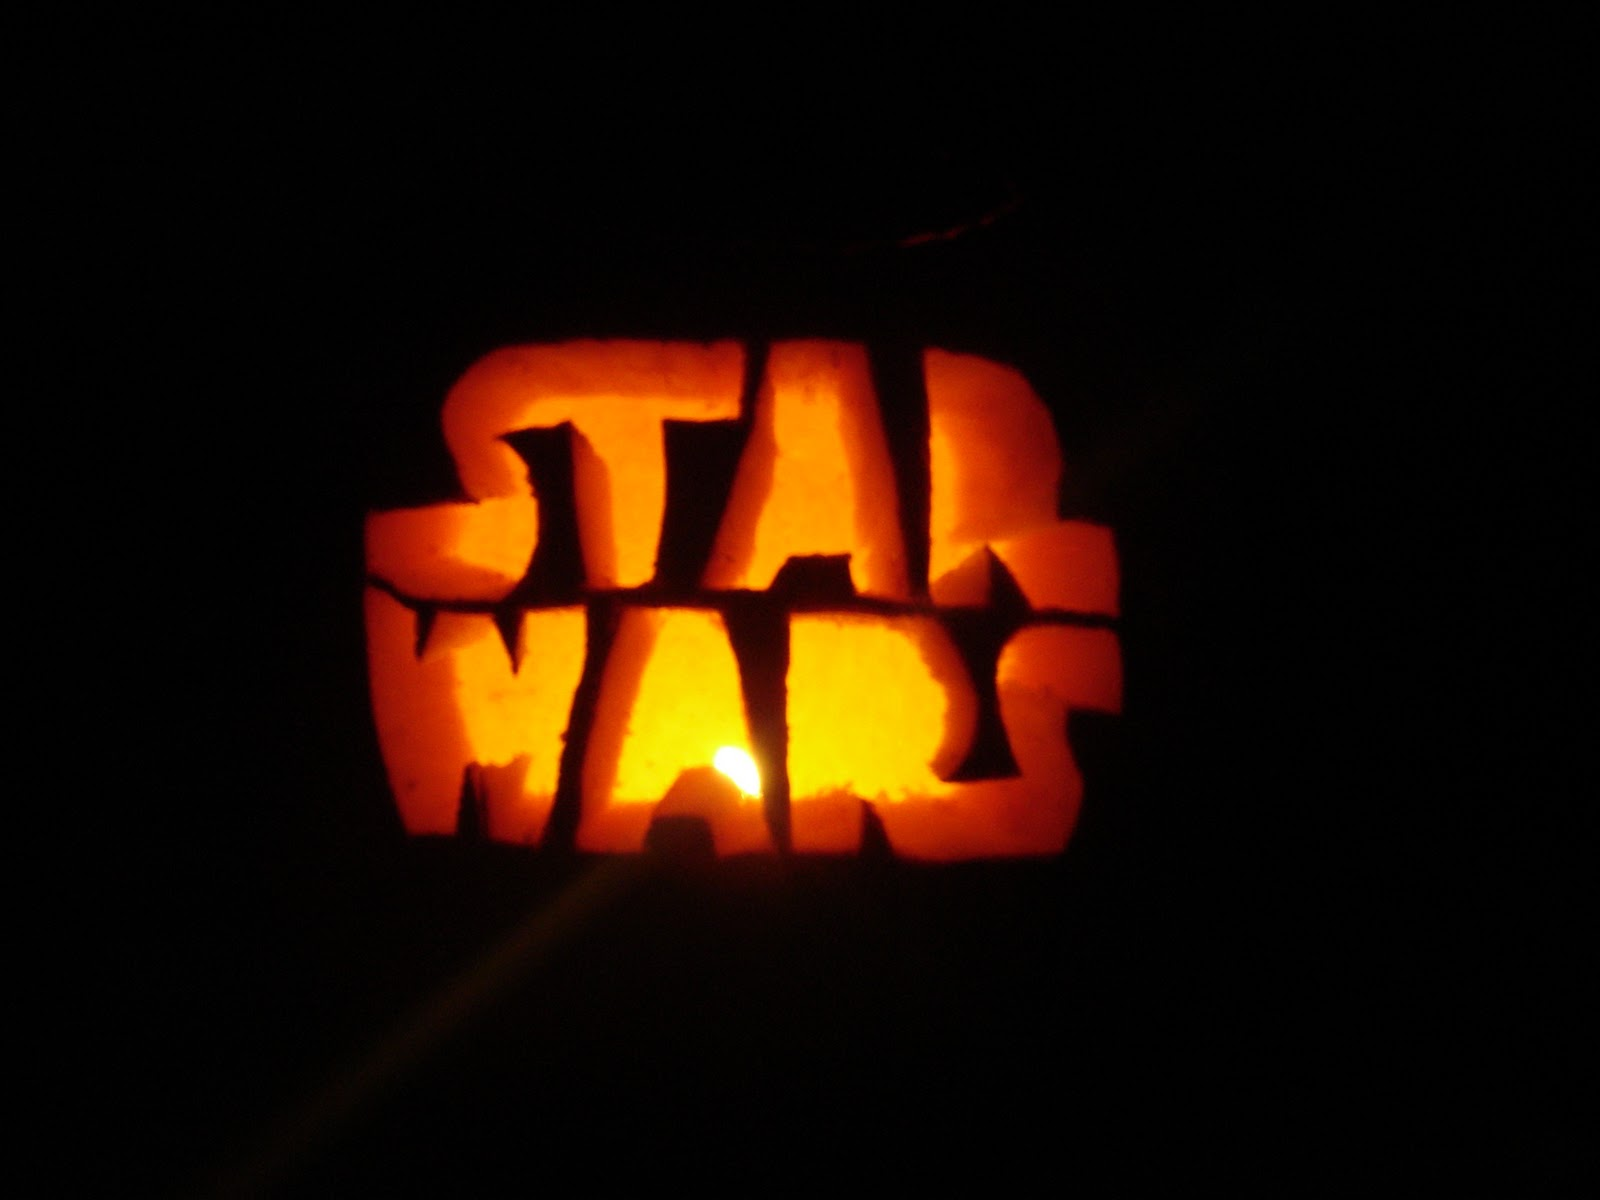 Star wars logo pumpkin carving patterns hot girls wallpaper